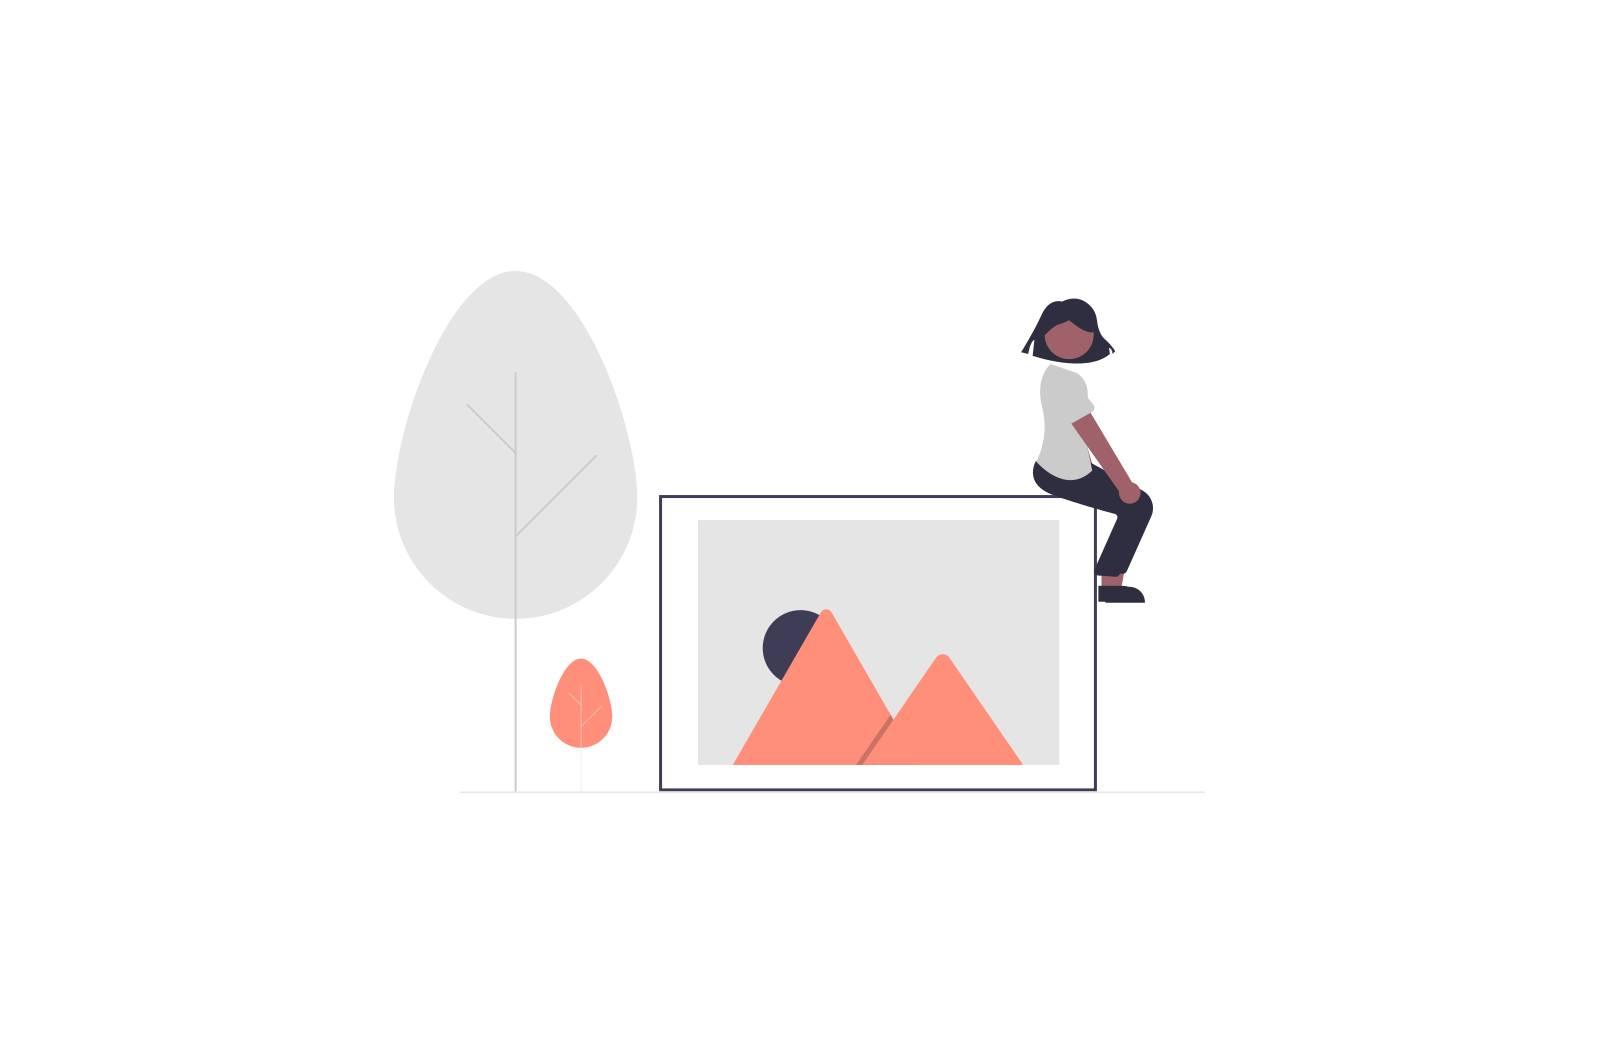 optimizar-imagenes-seo-local